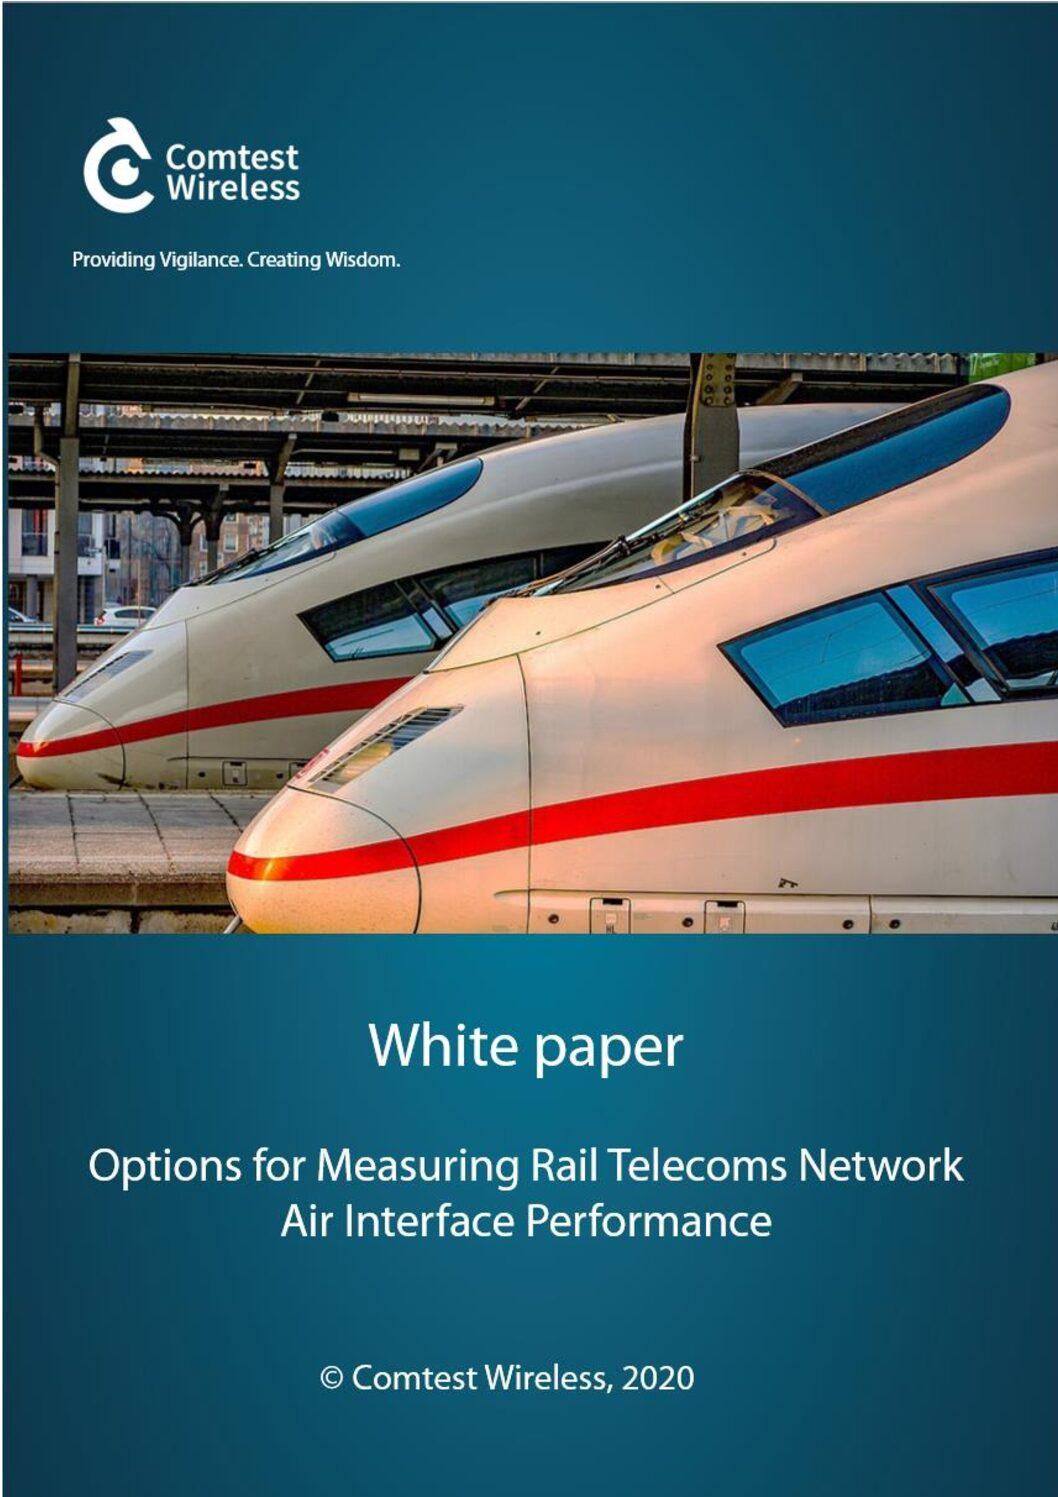 Measuring Rail Telecoms Network Air Interface Performance